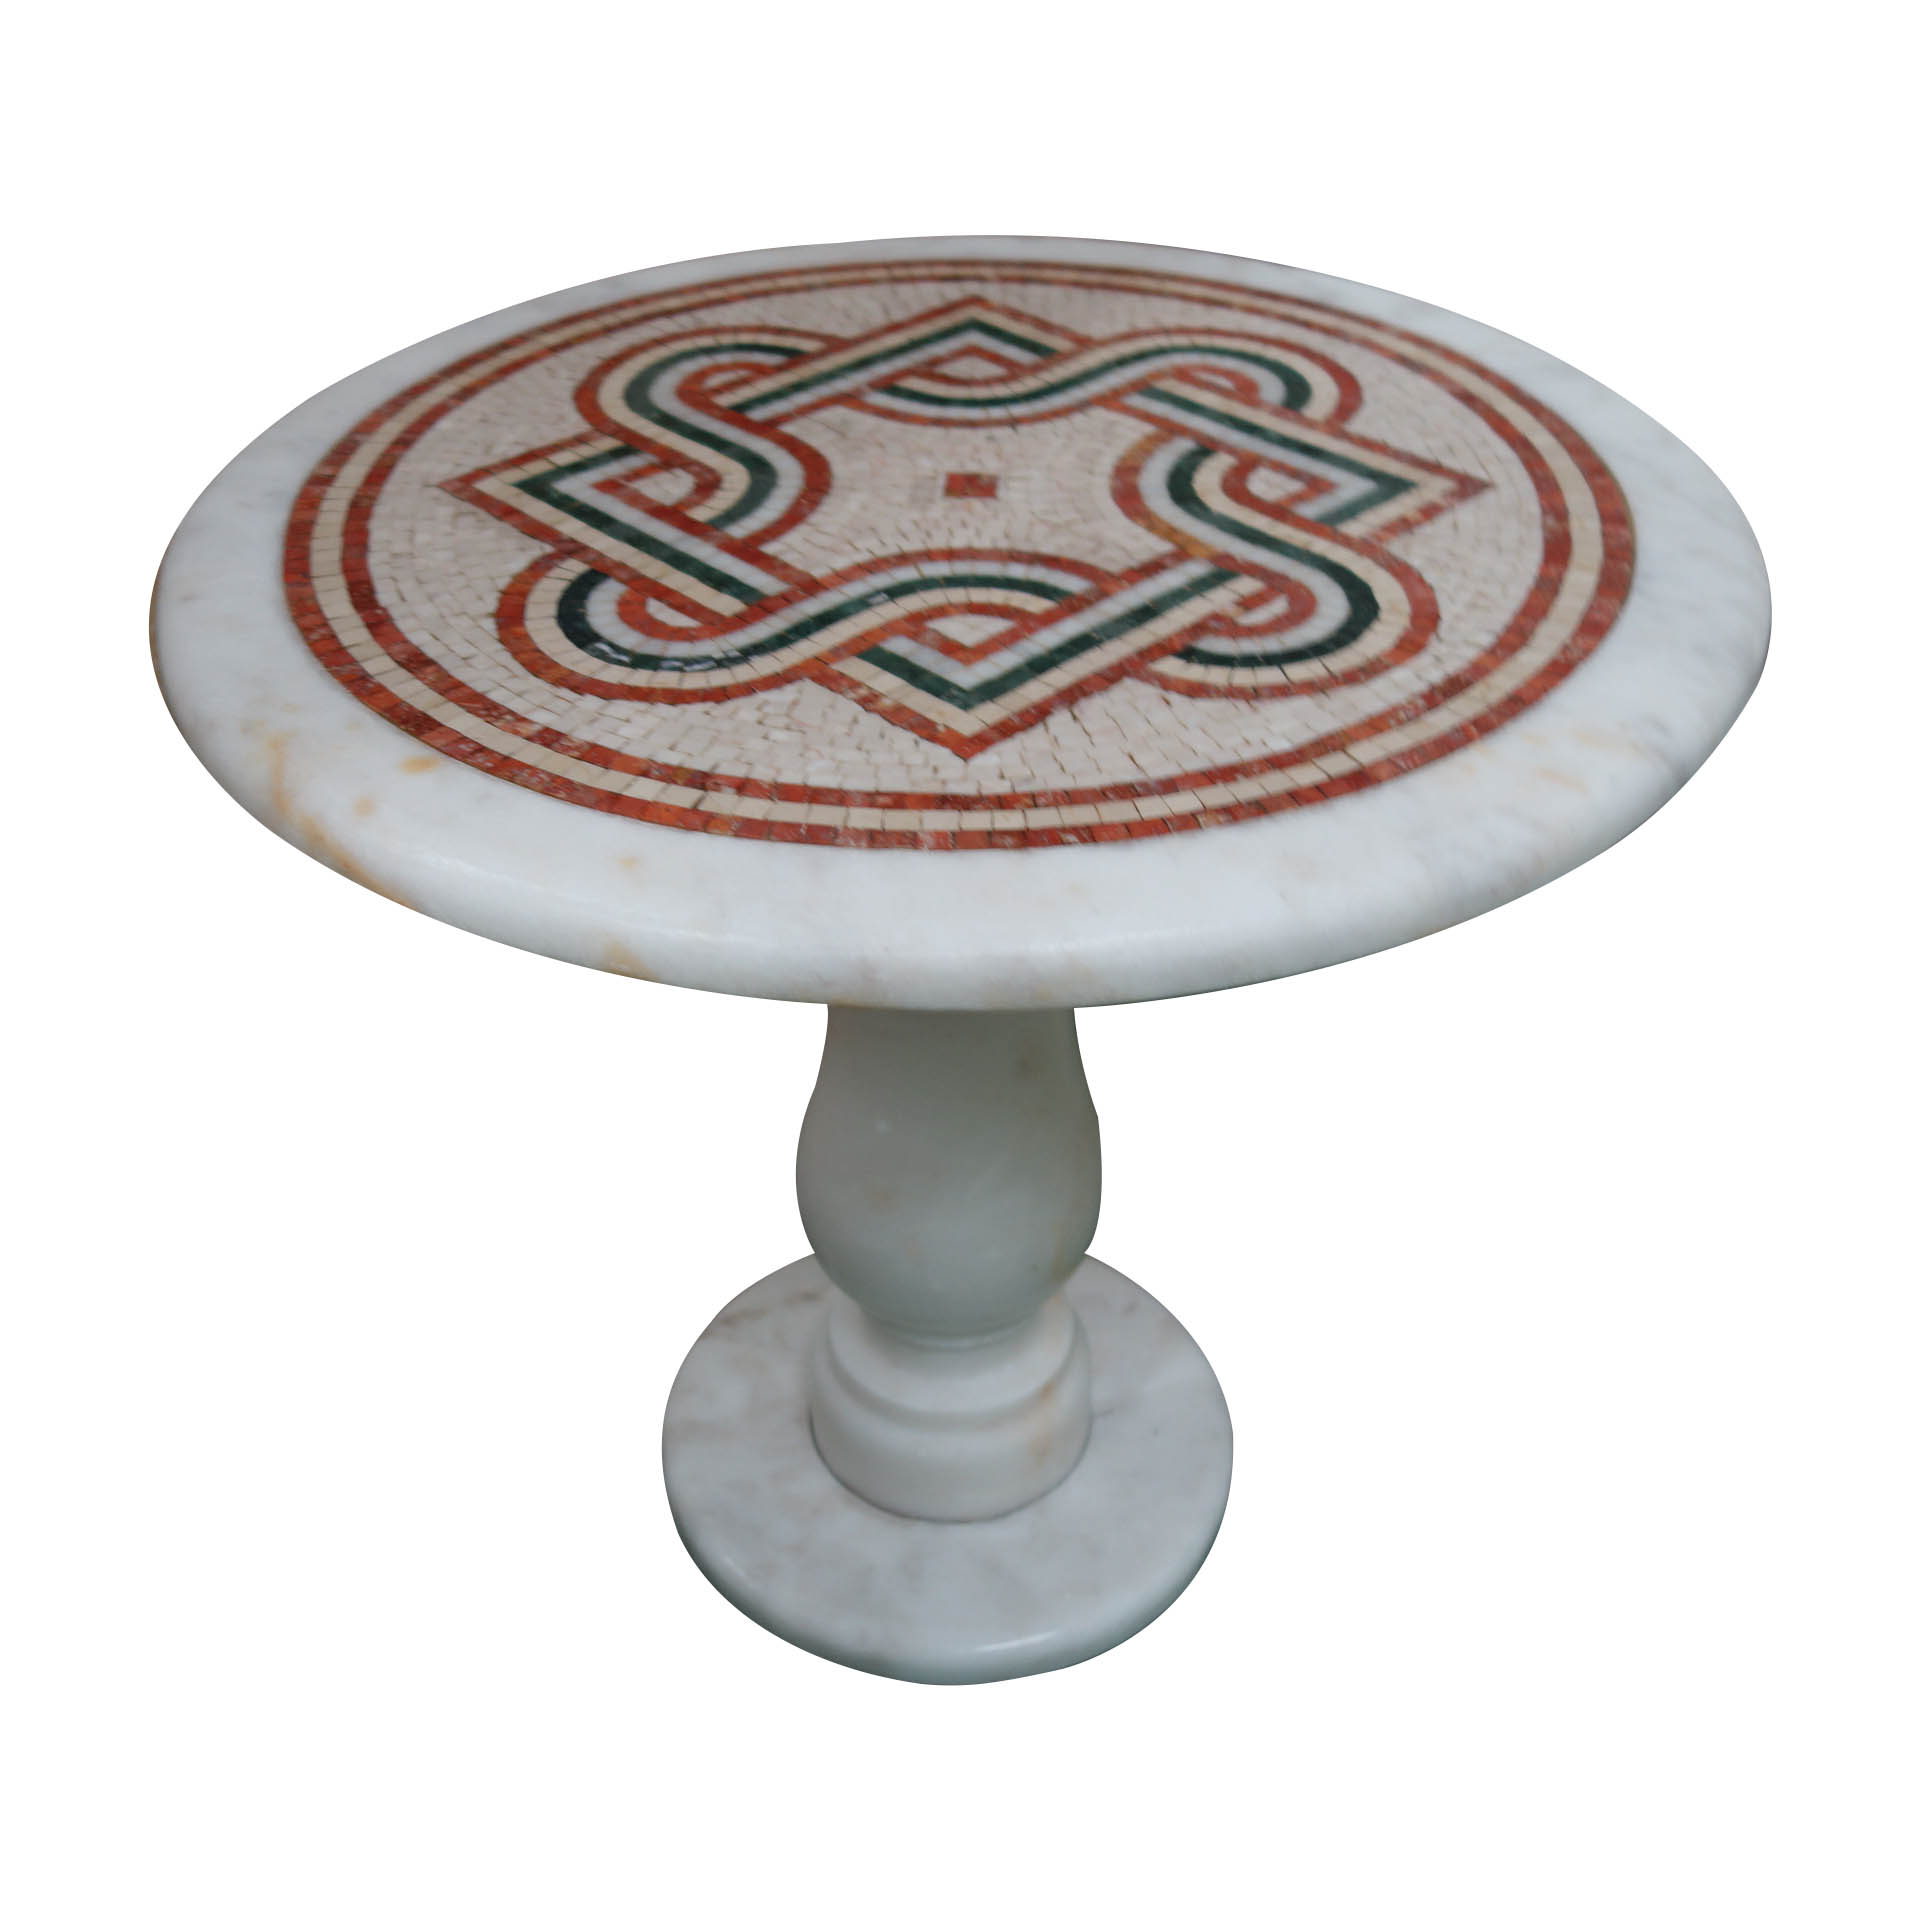 Overlapping geometric marble mosaic circular table TA-004